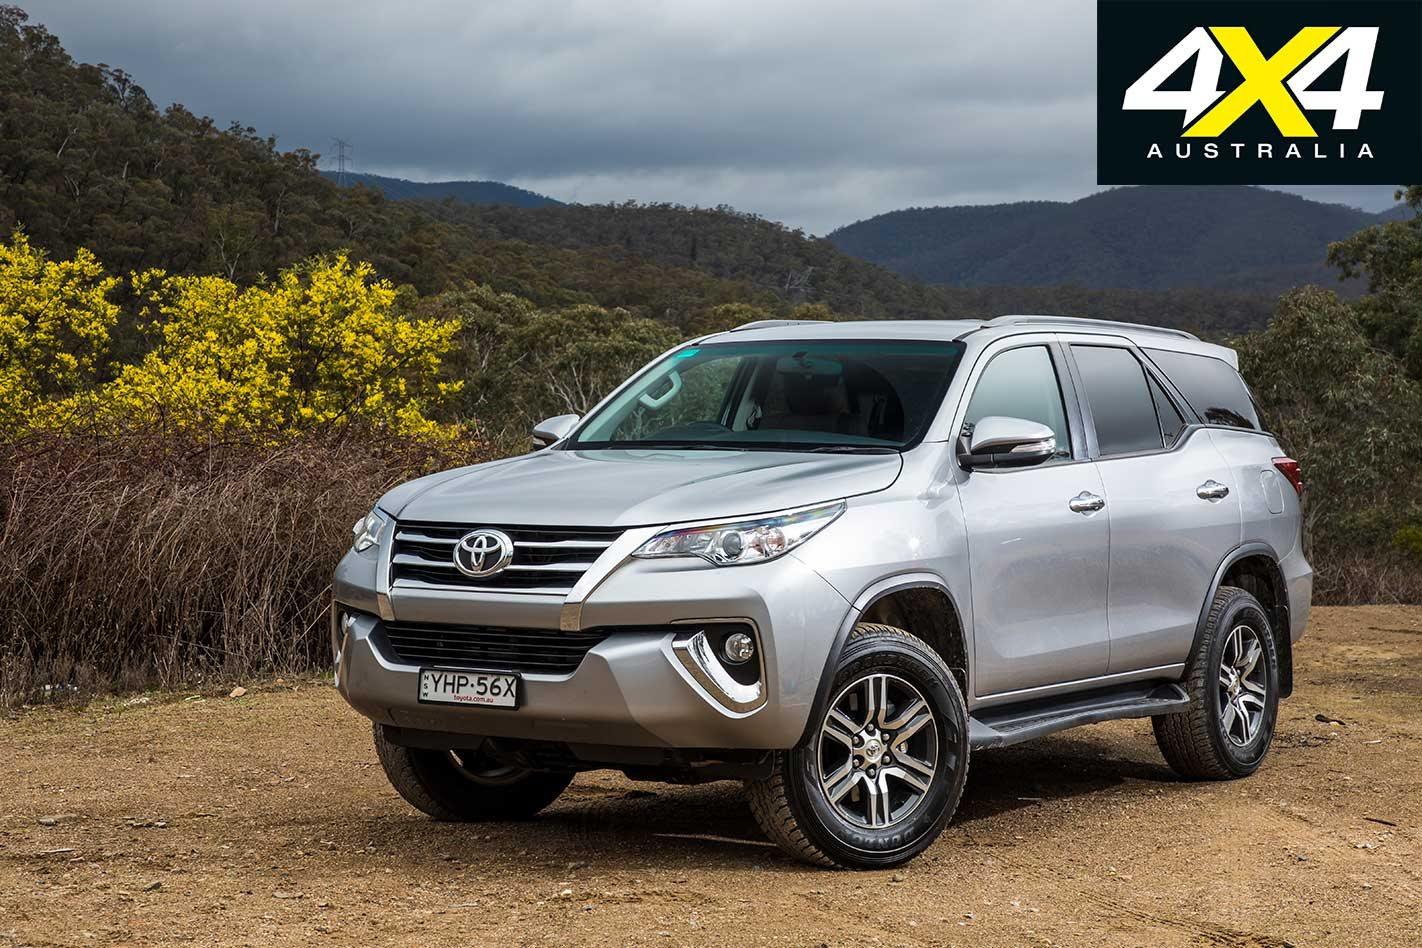 2018 Toyota Prado vs Toyota Fortuner 4x4 comparison review